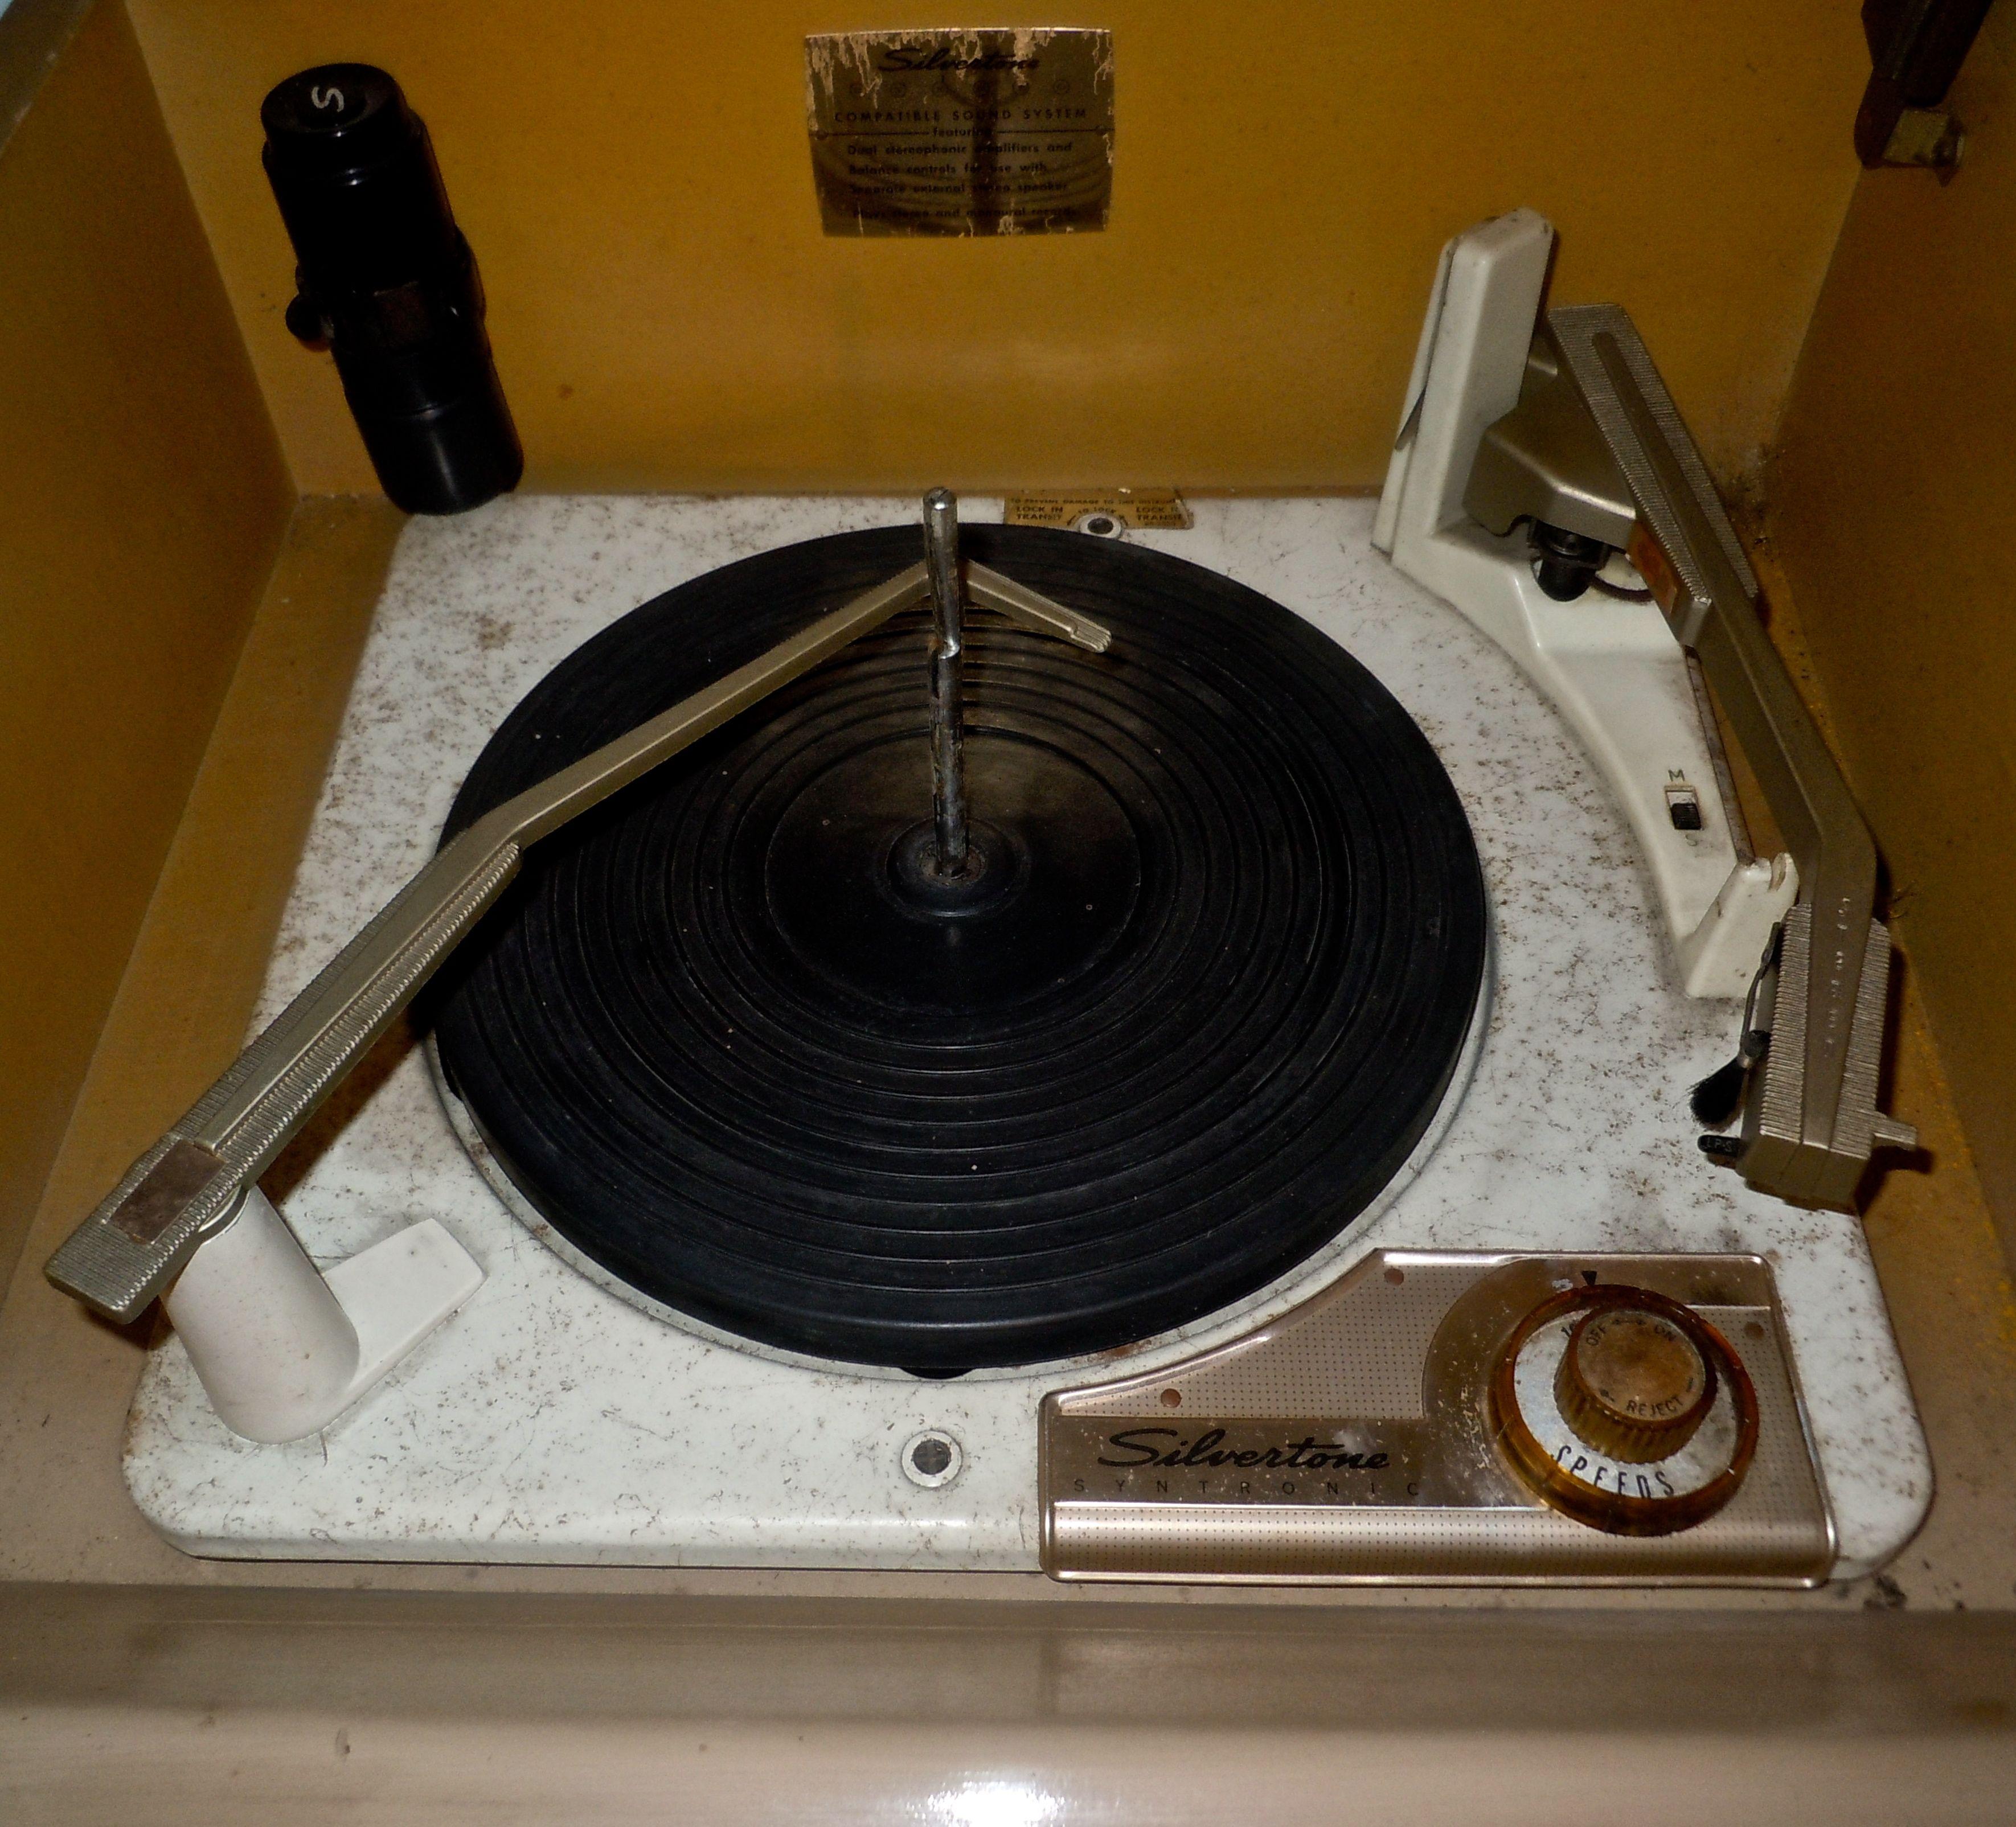 goodman aruf air handler wiring diagram 94 acura integra stereo ge t361g record player diagram,t • creativeand.co